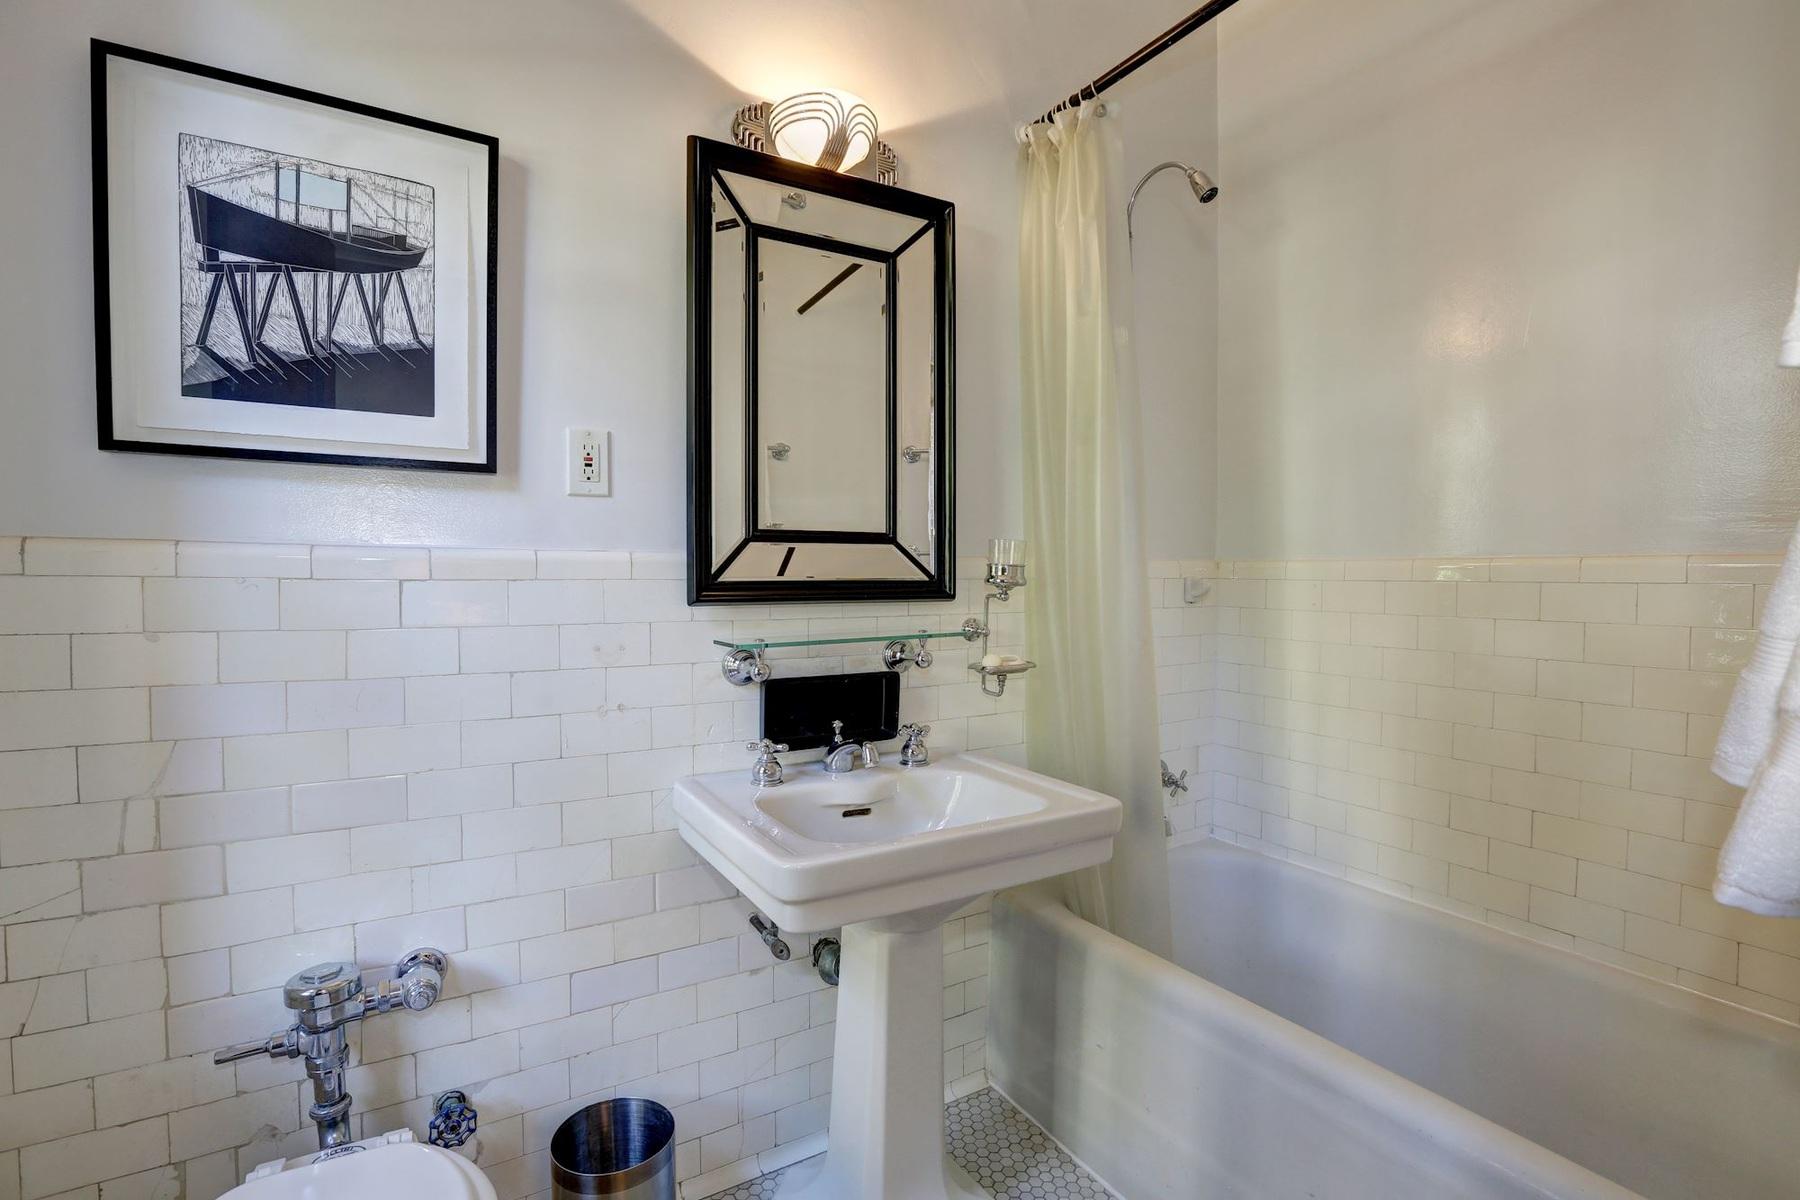 Additional photo for property listing at 1661 Crescent Place 210, Washington 1661 Crescent Pl 210 Washington, Distrito De Columbia 20009 Estados Unidos